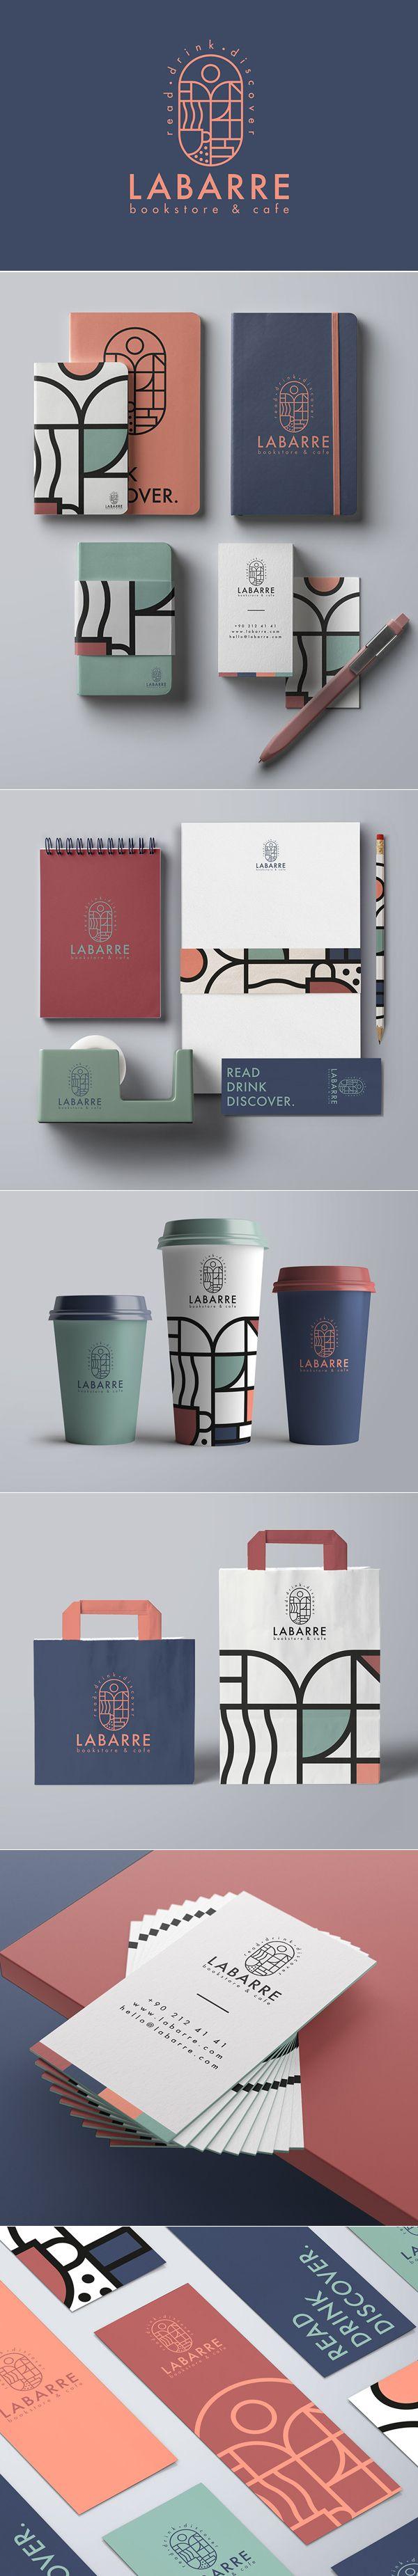 Branding: Labarre Bookstore & Cafe Branding Design…